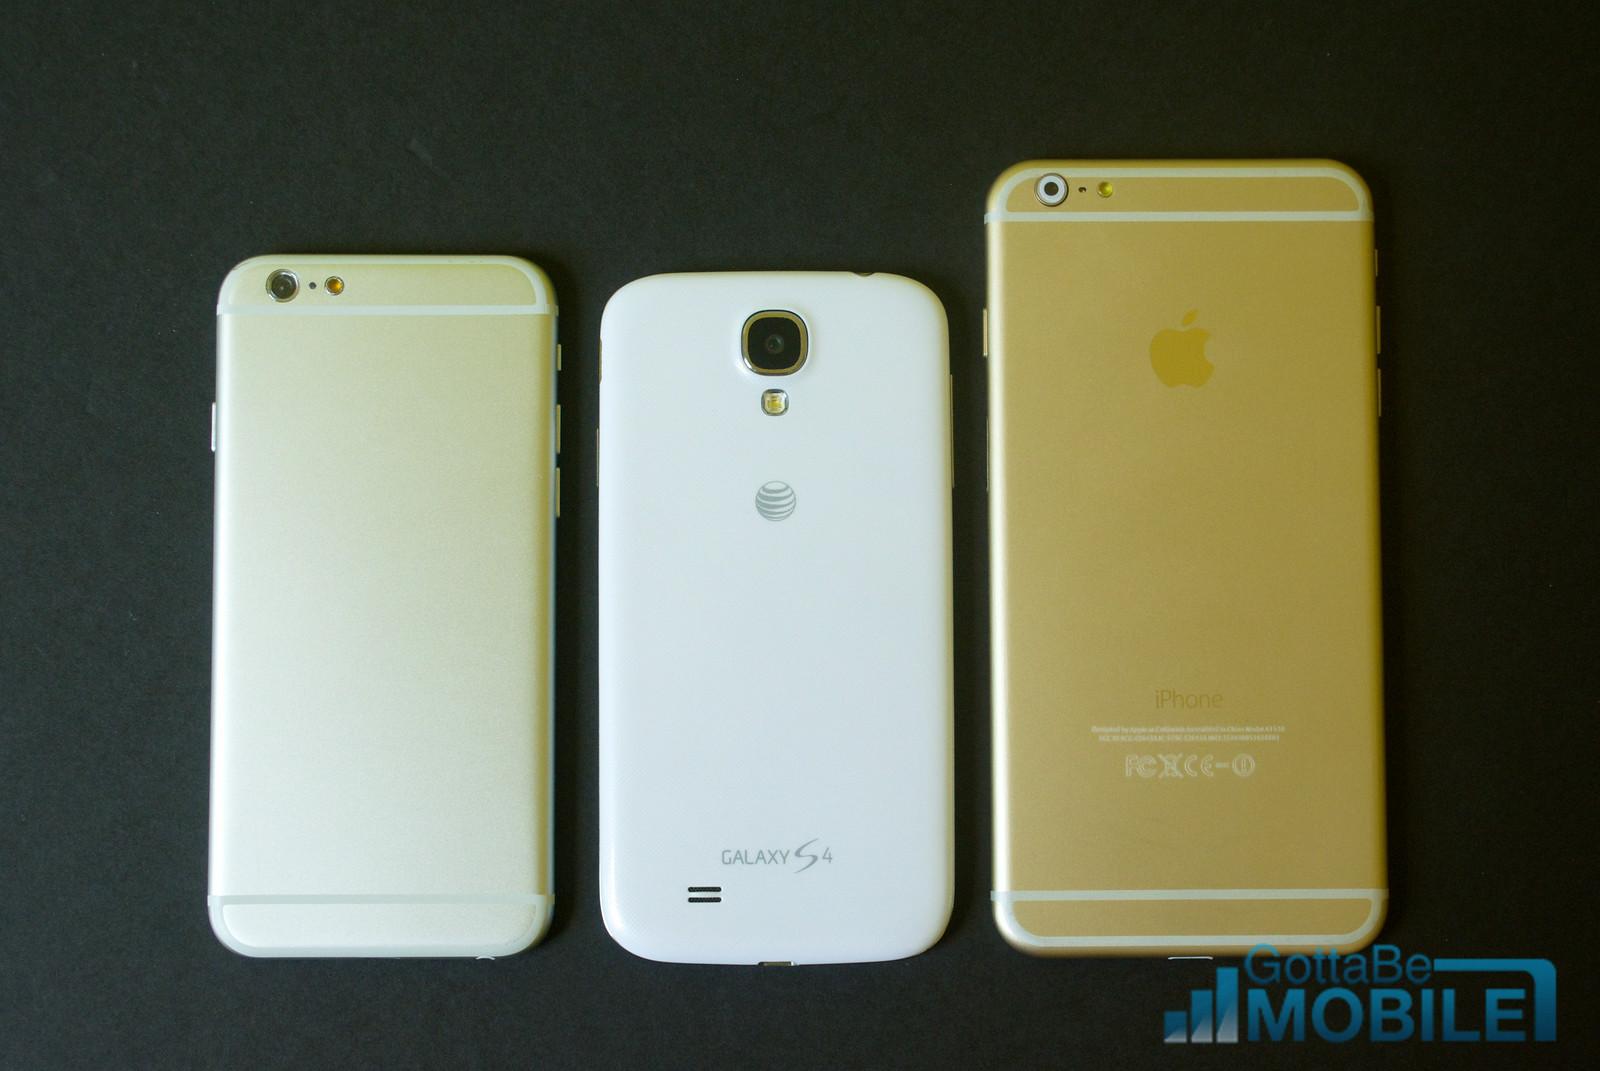 Iphone 4 Vs Iphone 6 Size Comparison